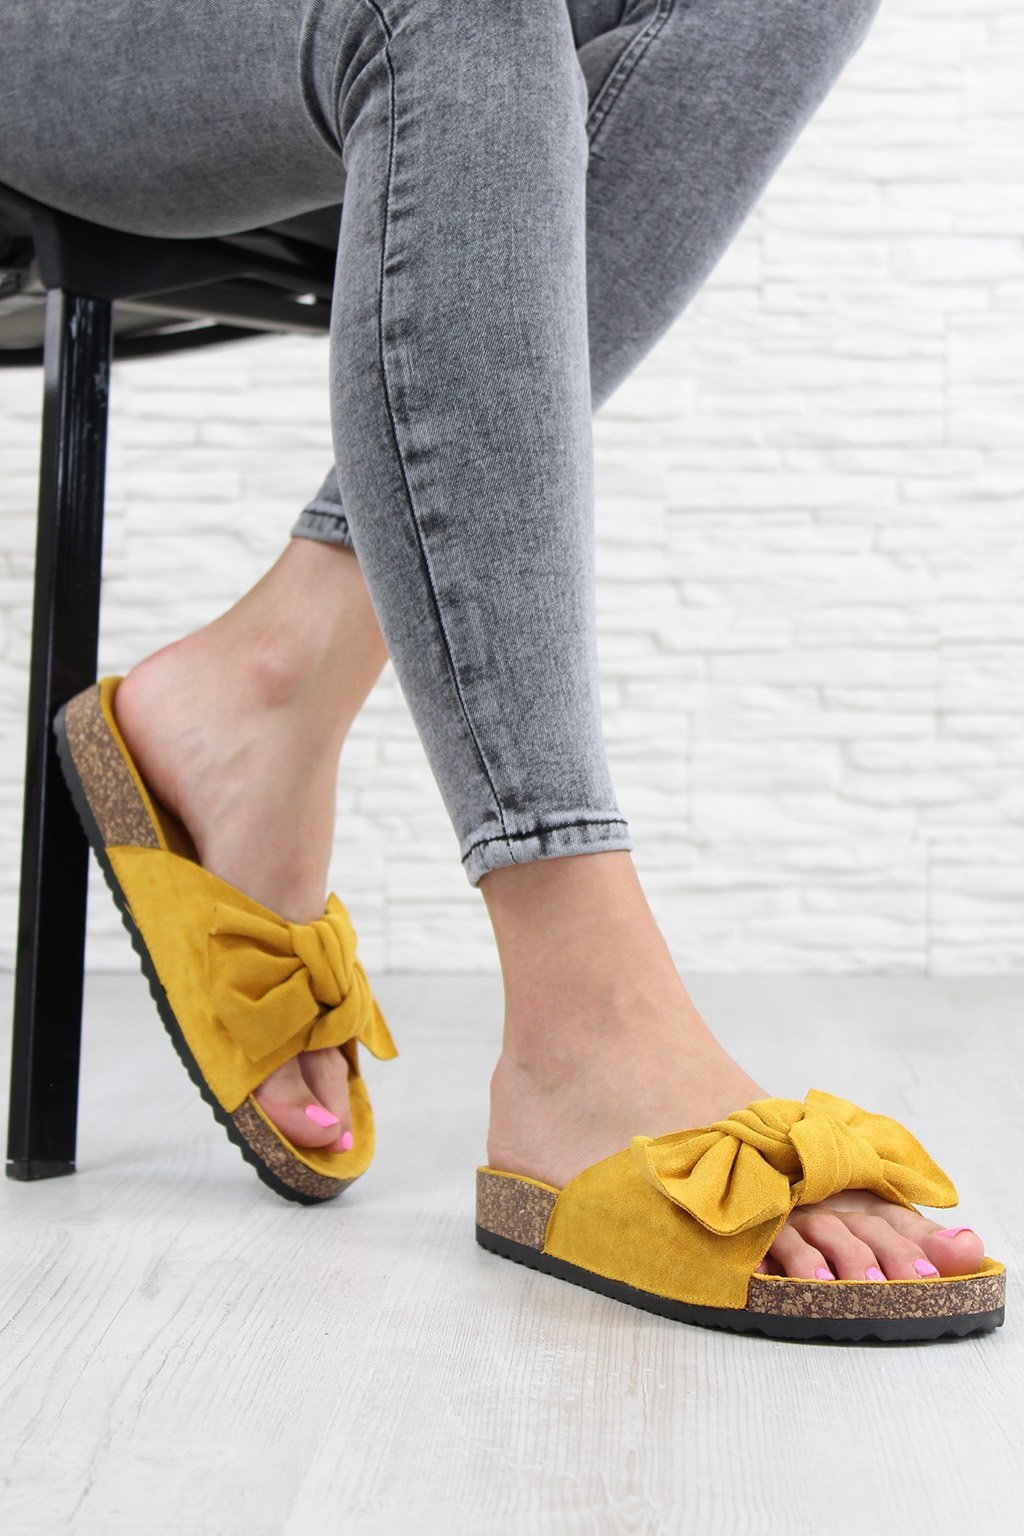 711 4YE Hořčicové pantofle (2)